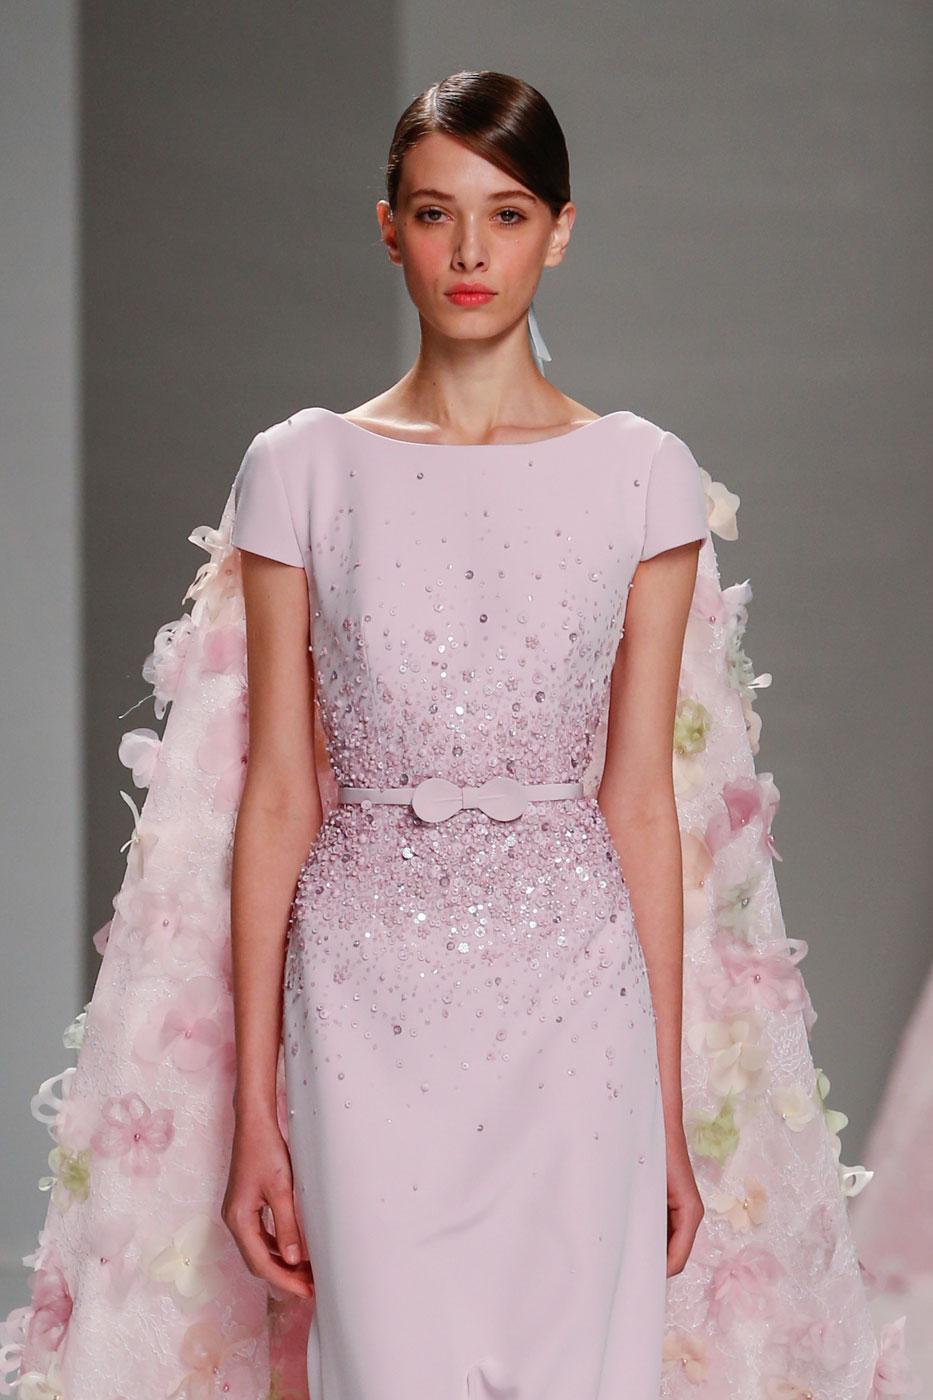 Georges-Hobeika-fashion-runway-show-haute-couture-paris-spring-2015-the-impression-82